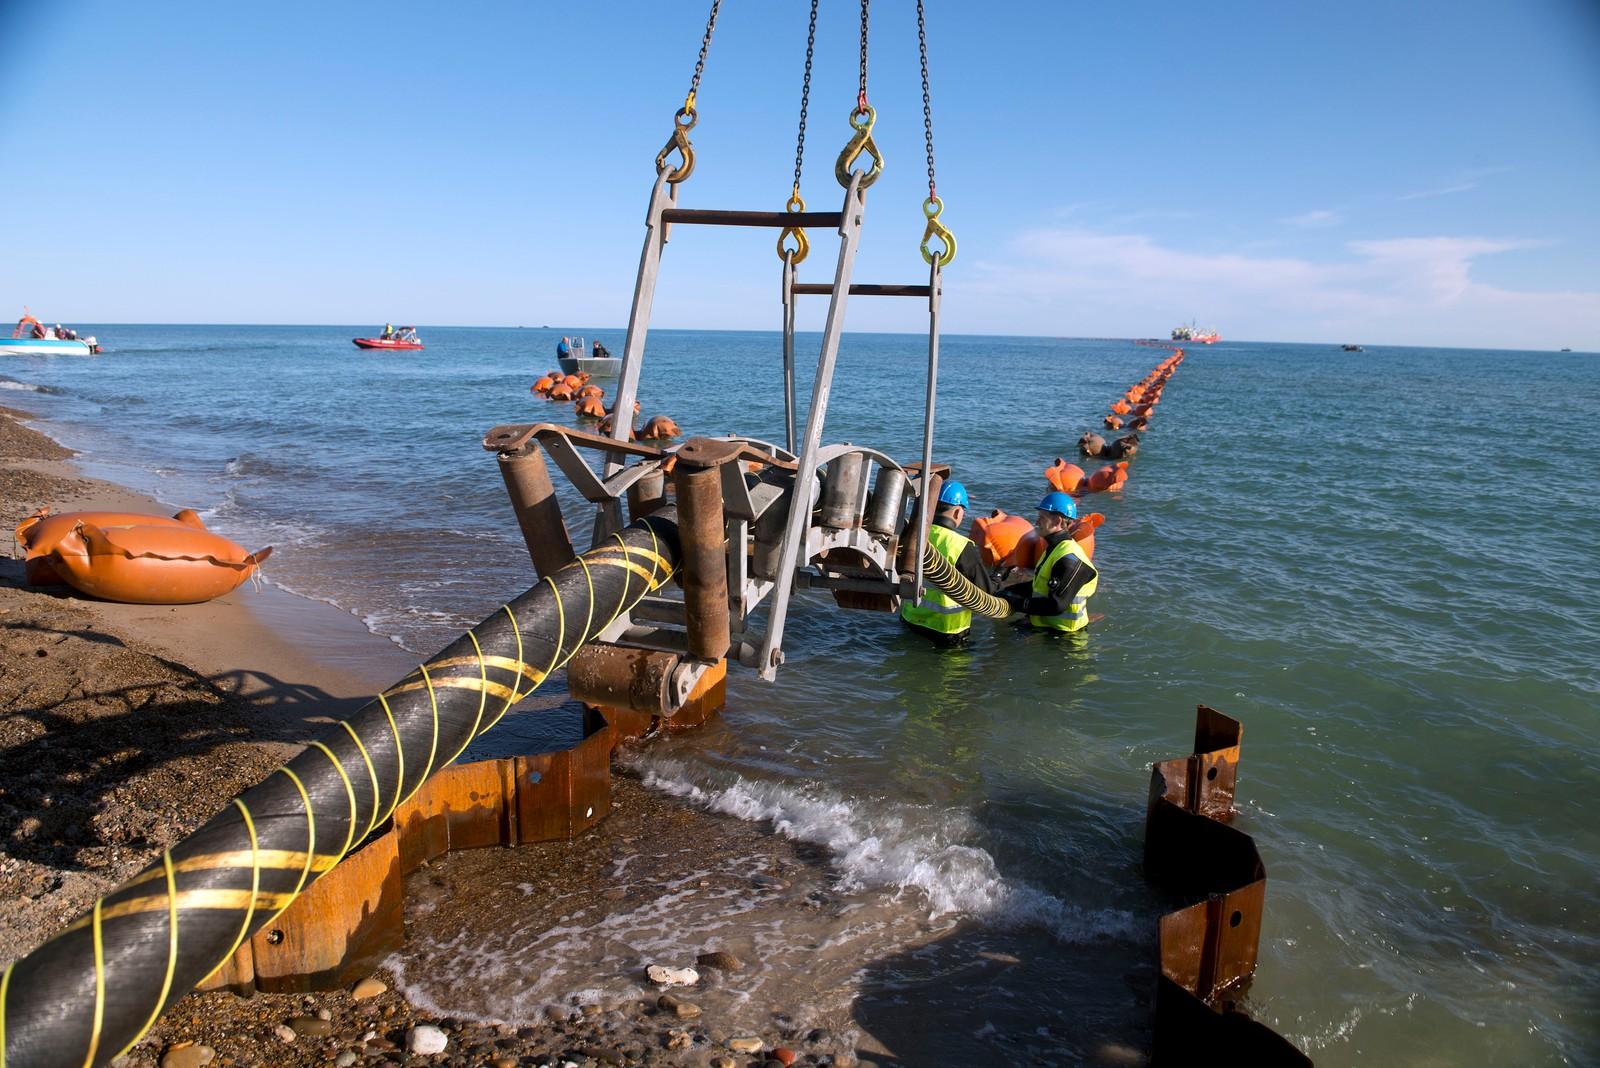 Energinet.dk og Stattnett i Norge, lægge ca 140 km kabel tværs over Skagerrak fra Bulbjerg strand i Jammerbugt til Kristiansand i Norge. Foto: © Lars Horn / Baghuset Date : 24.07.13